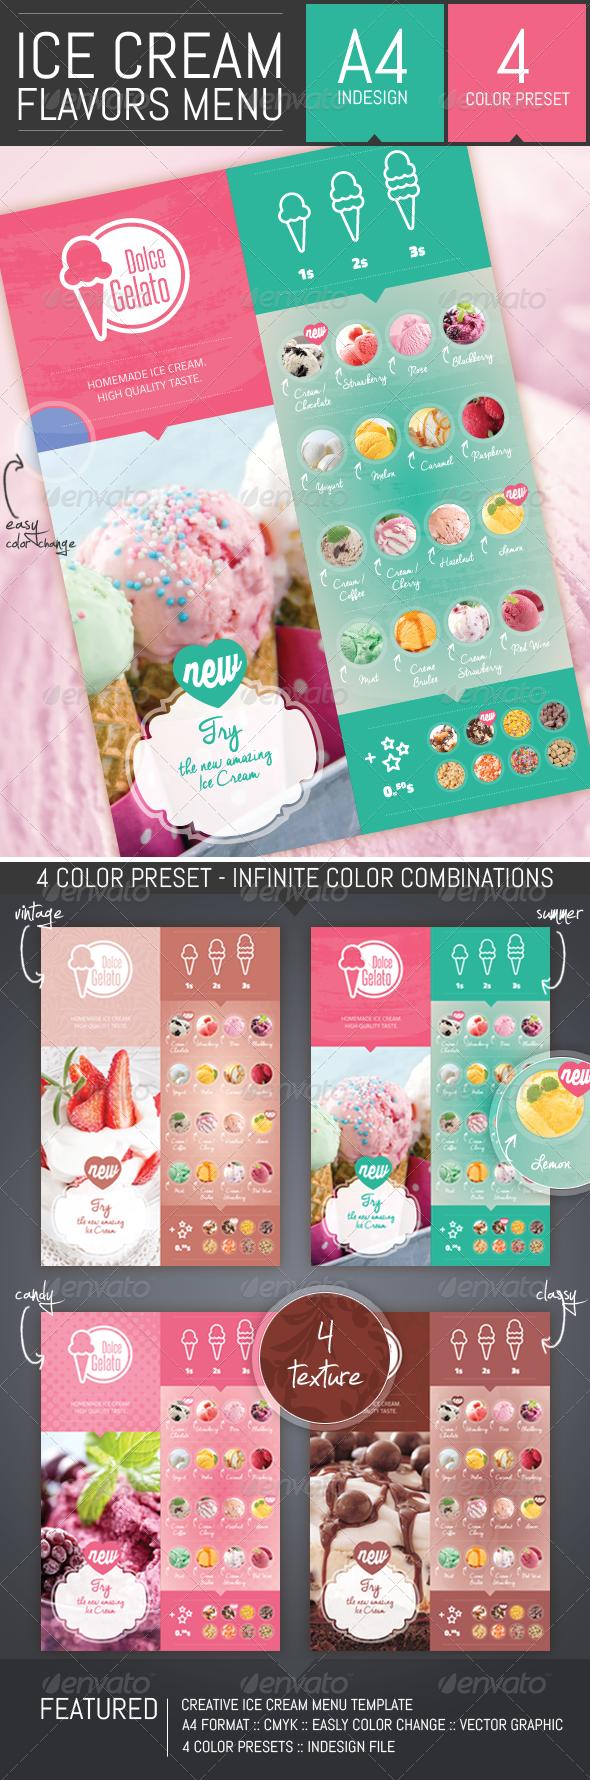 Ice Cream Flavor Menu Template by DogmaDesign | GraphicRiver